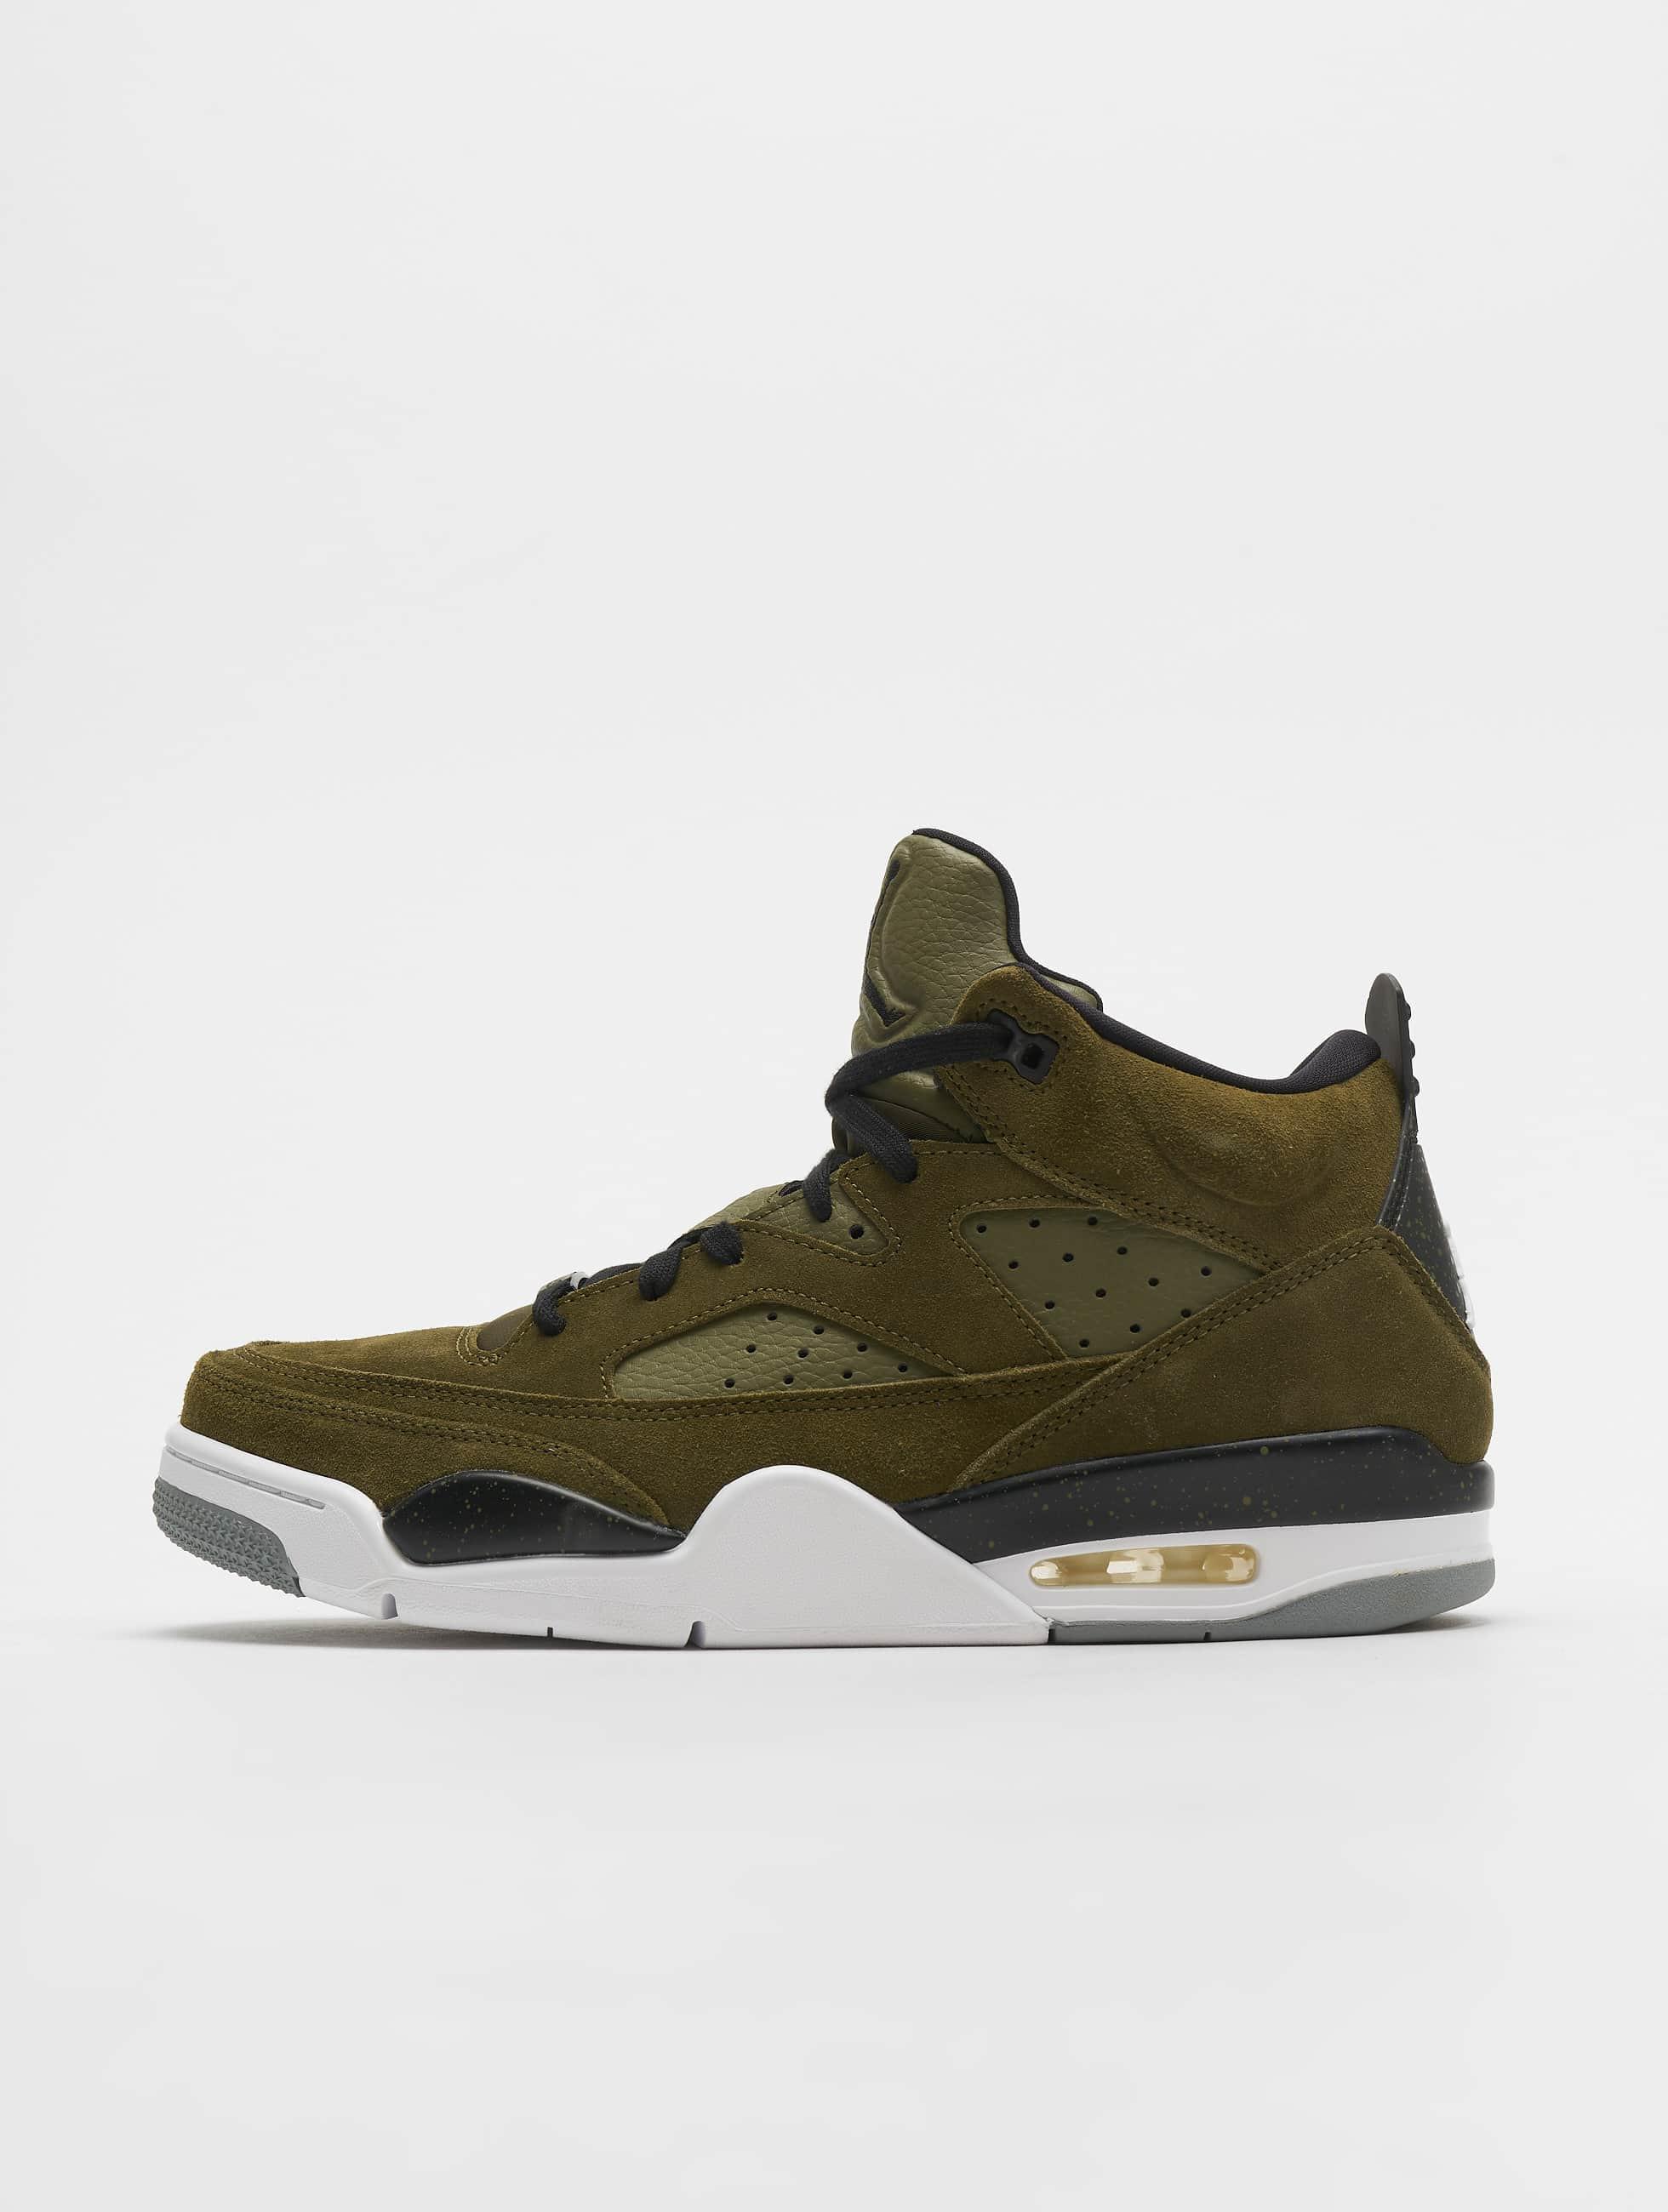 check out 2a49e 72ae1 Jordan schoen / sneaker Son of Mars in olijfgroen 498155